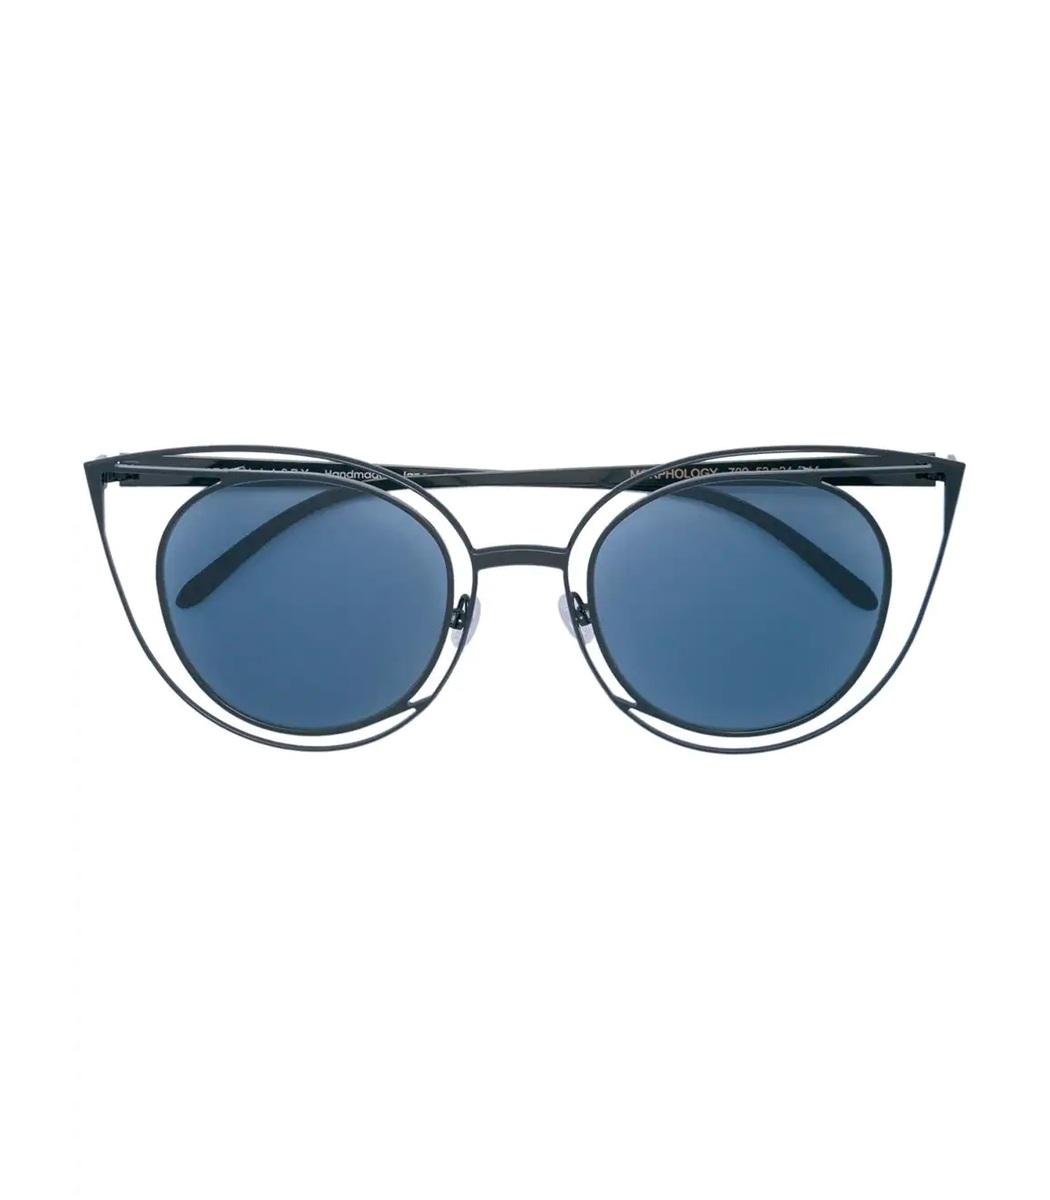 Thierry Lasry Morphology Cat Eye Sunglasses